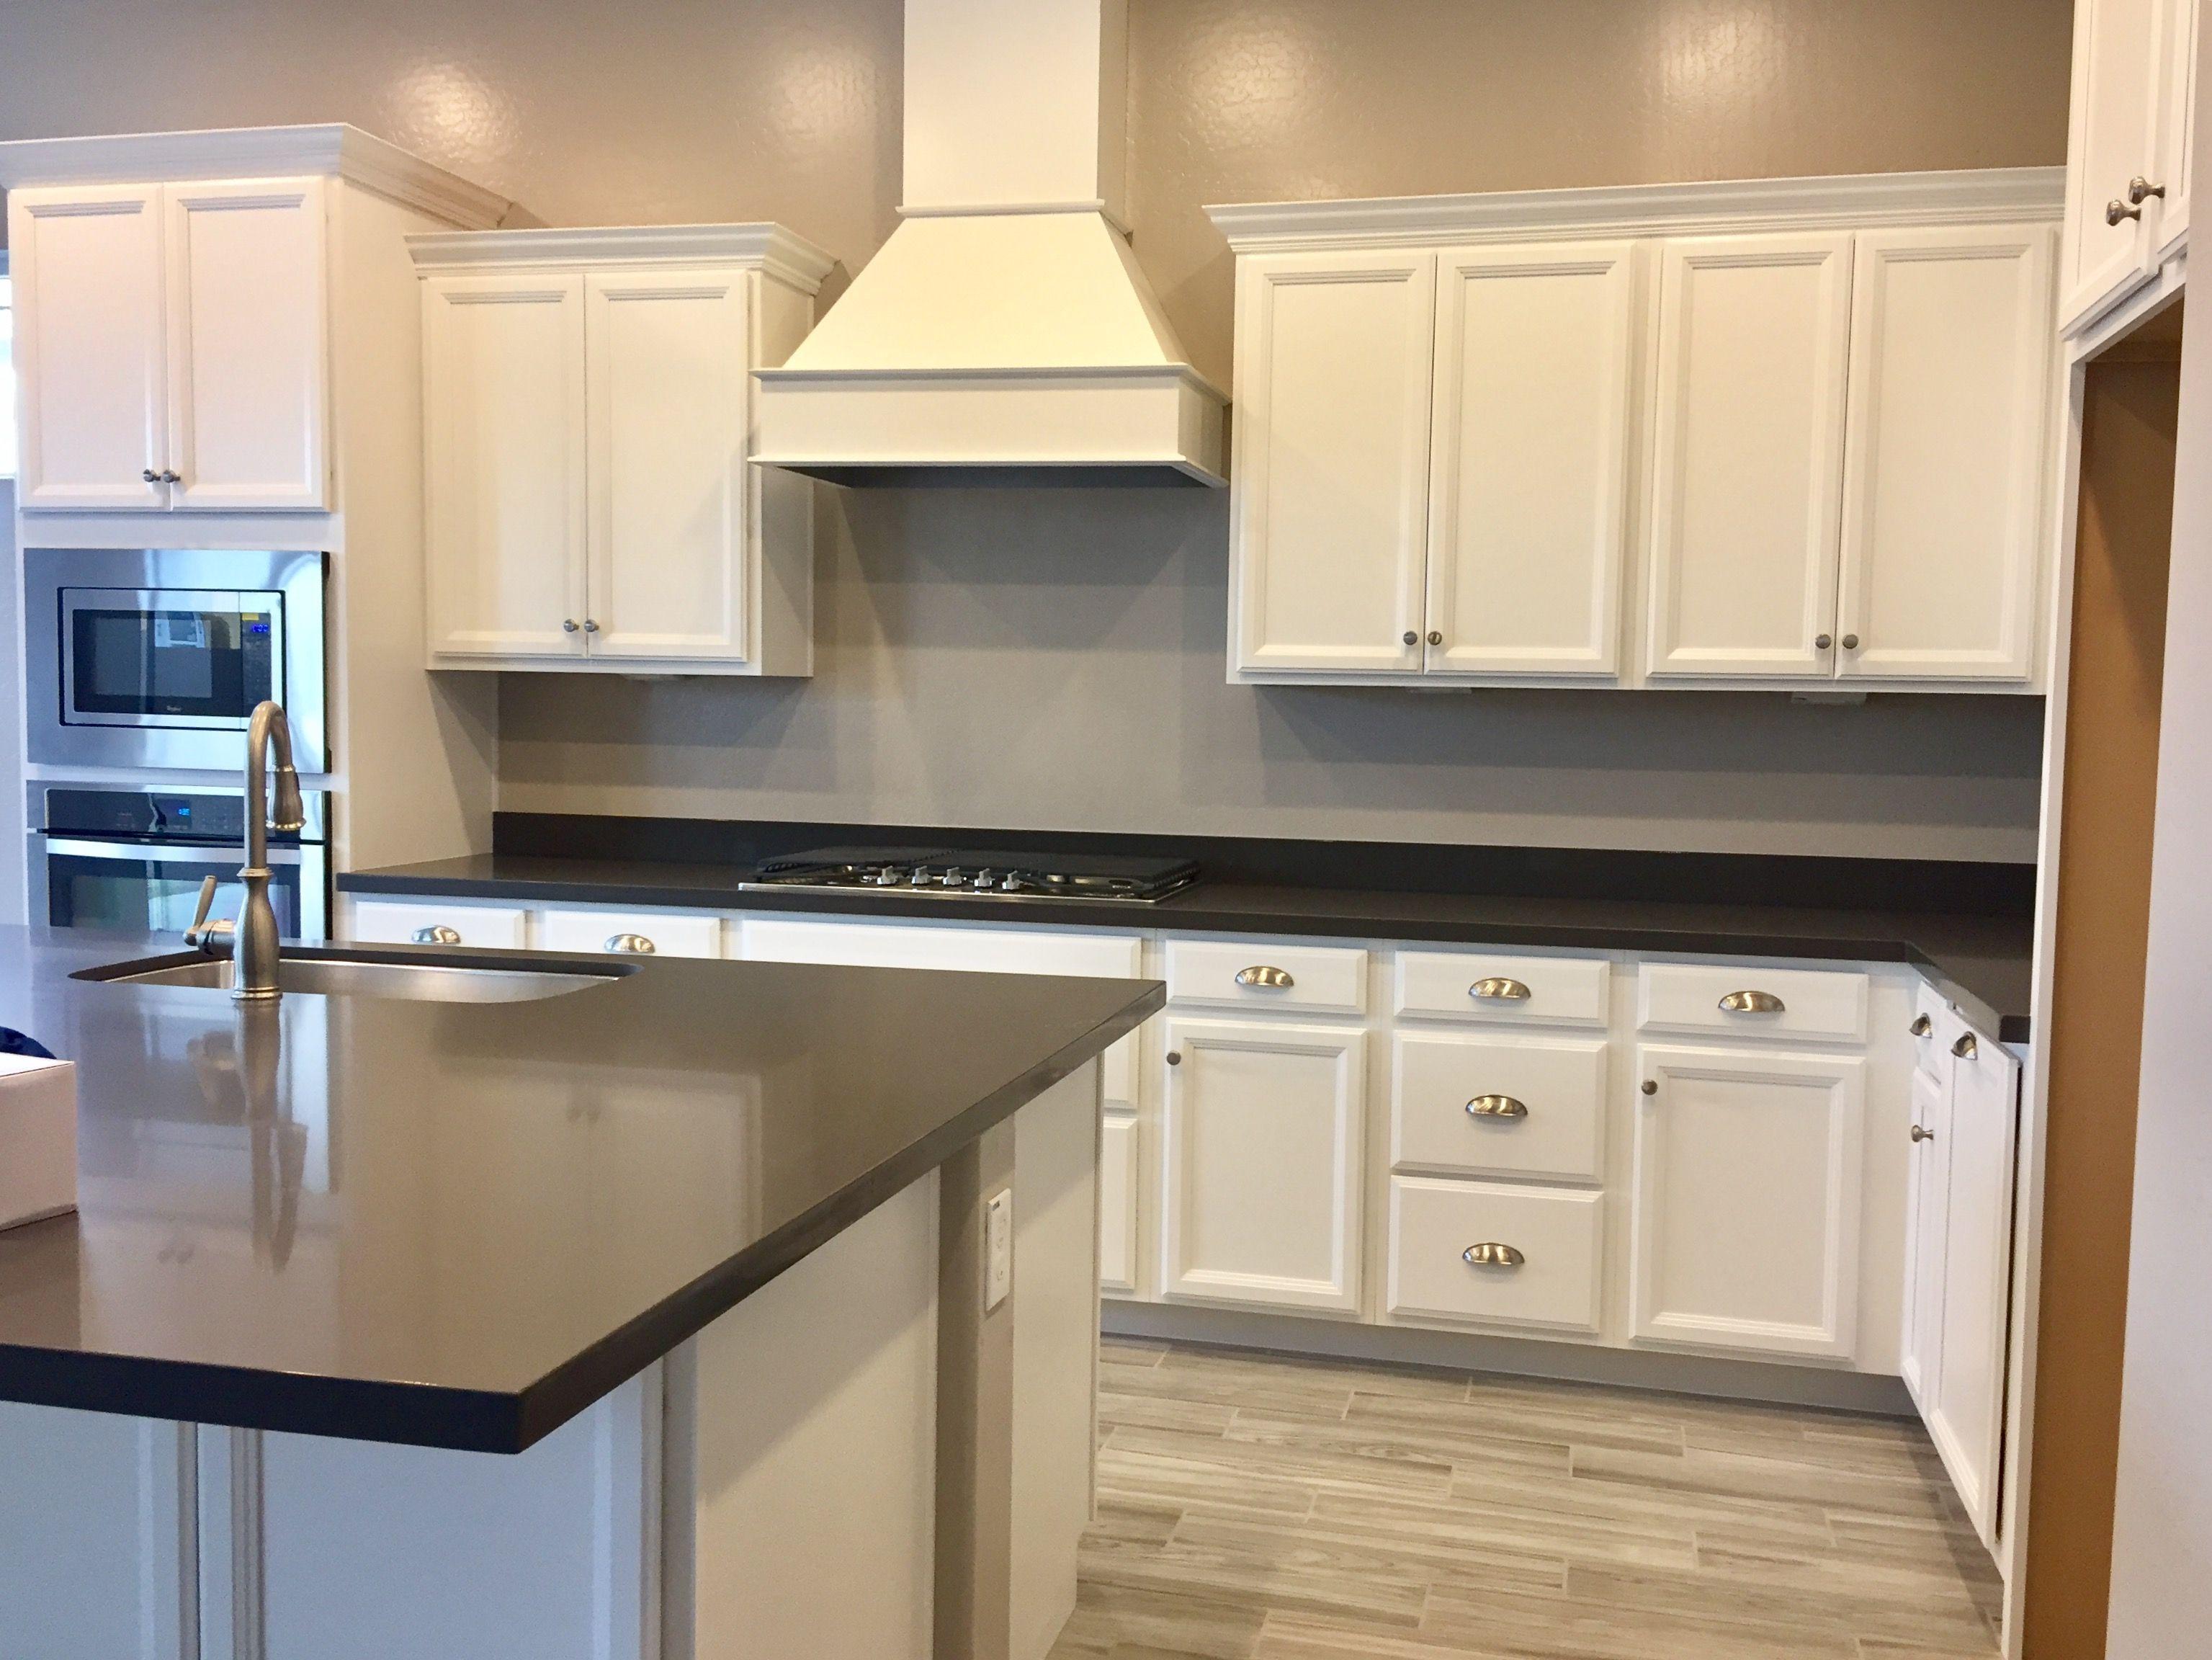 My Cocina Blanca Timberlake Tahoe Cabinets Timberlake Tahoe Kitchen Hood Cabinet Home Kitchens New Kitchen